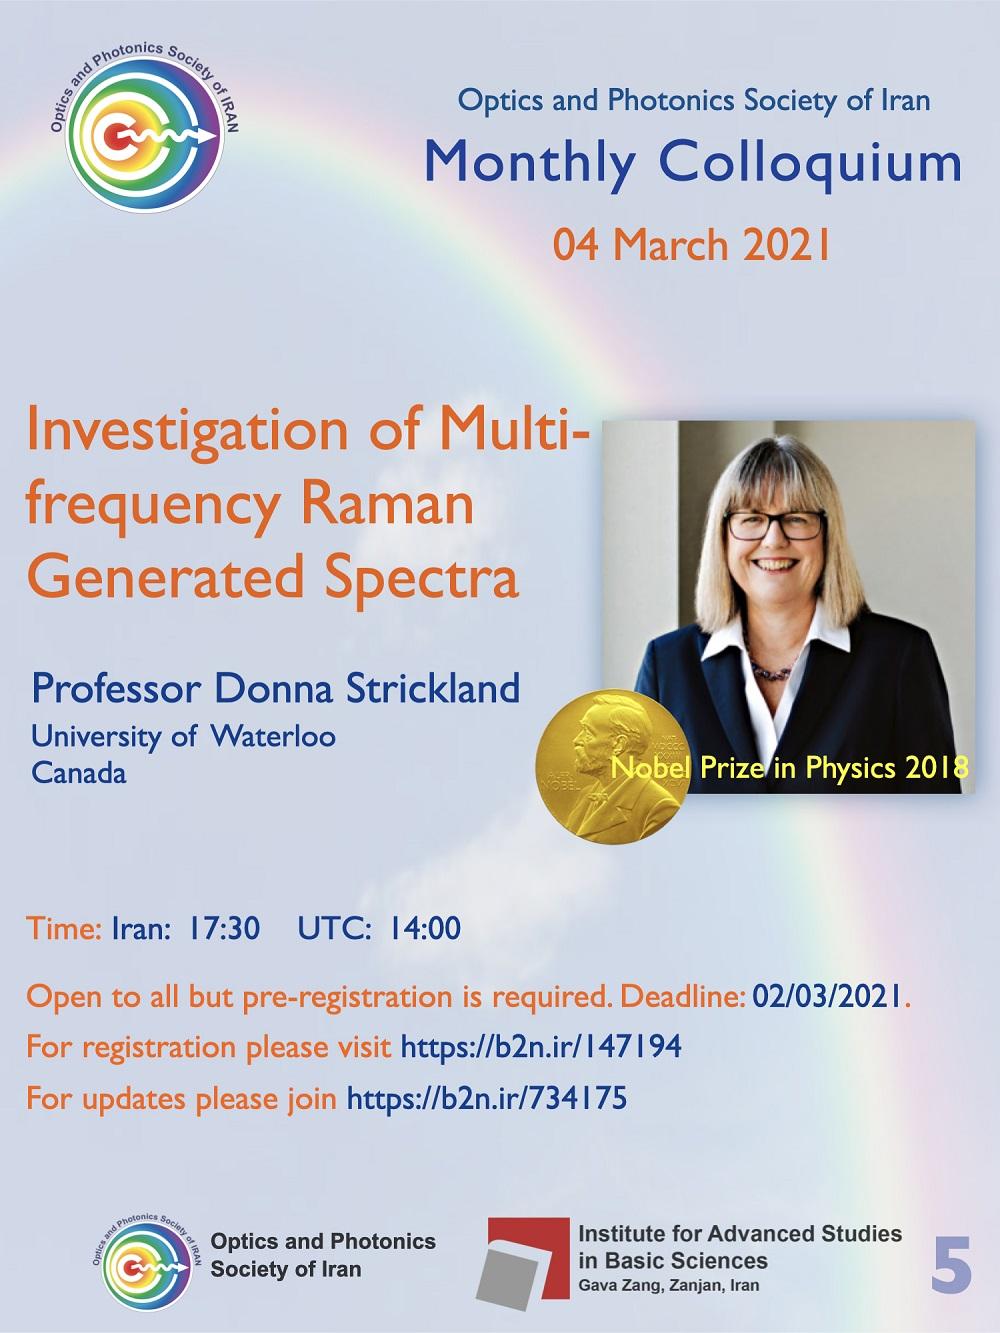 IASBS hosts Donna Strickland, 2018 Nobel Prize winner in Physics